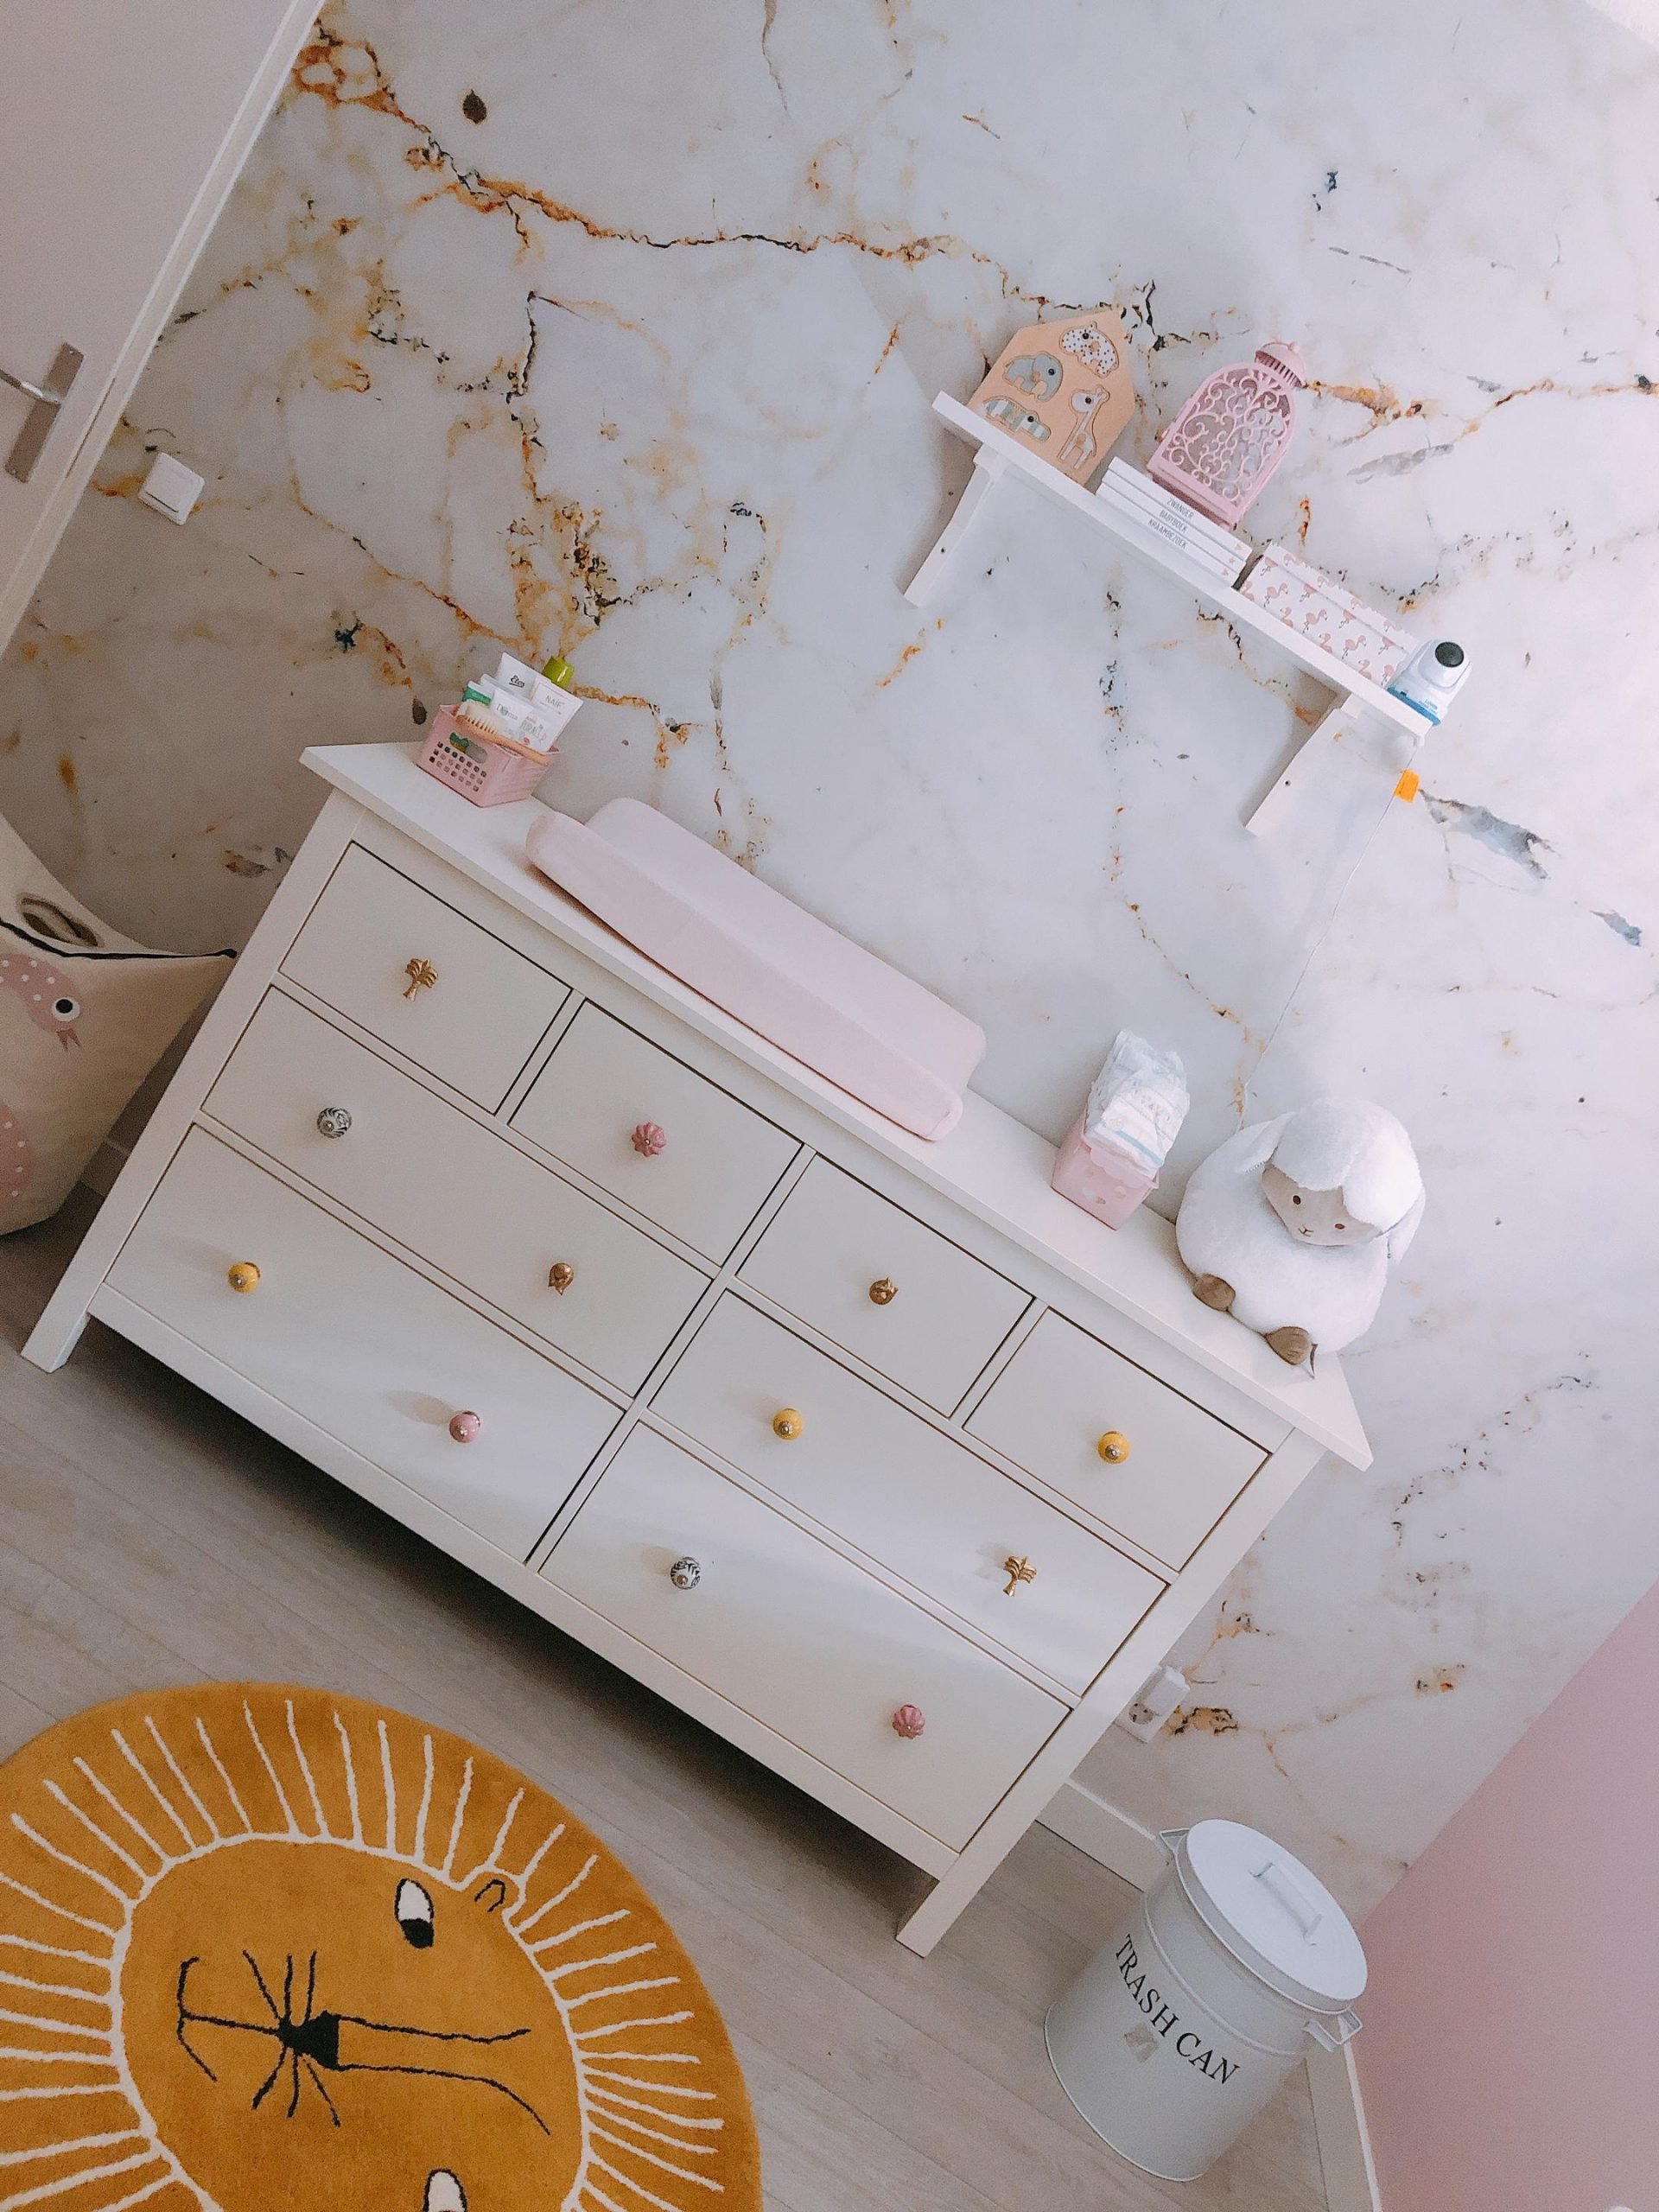 IMG 6920 2160x2880 1 scaled - De baby/kinderkamer van Hazel - roze, hout & marmer!